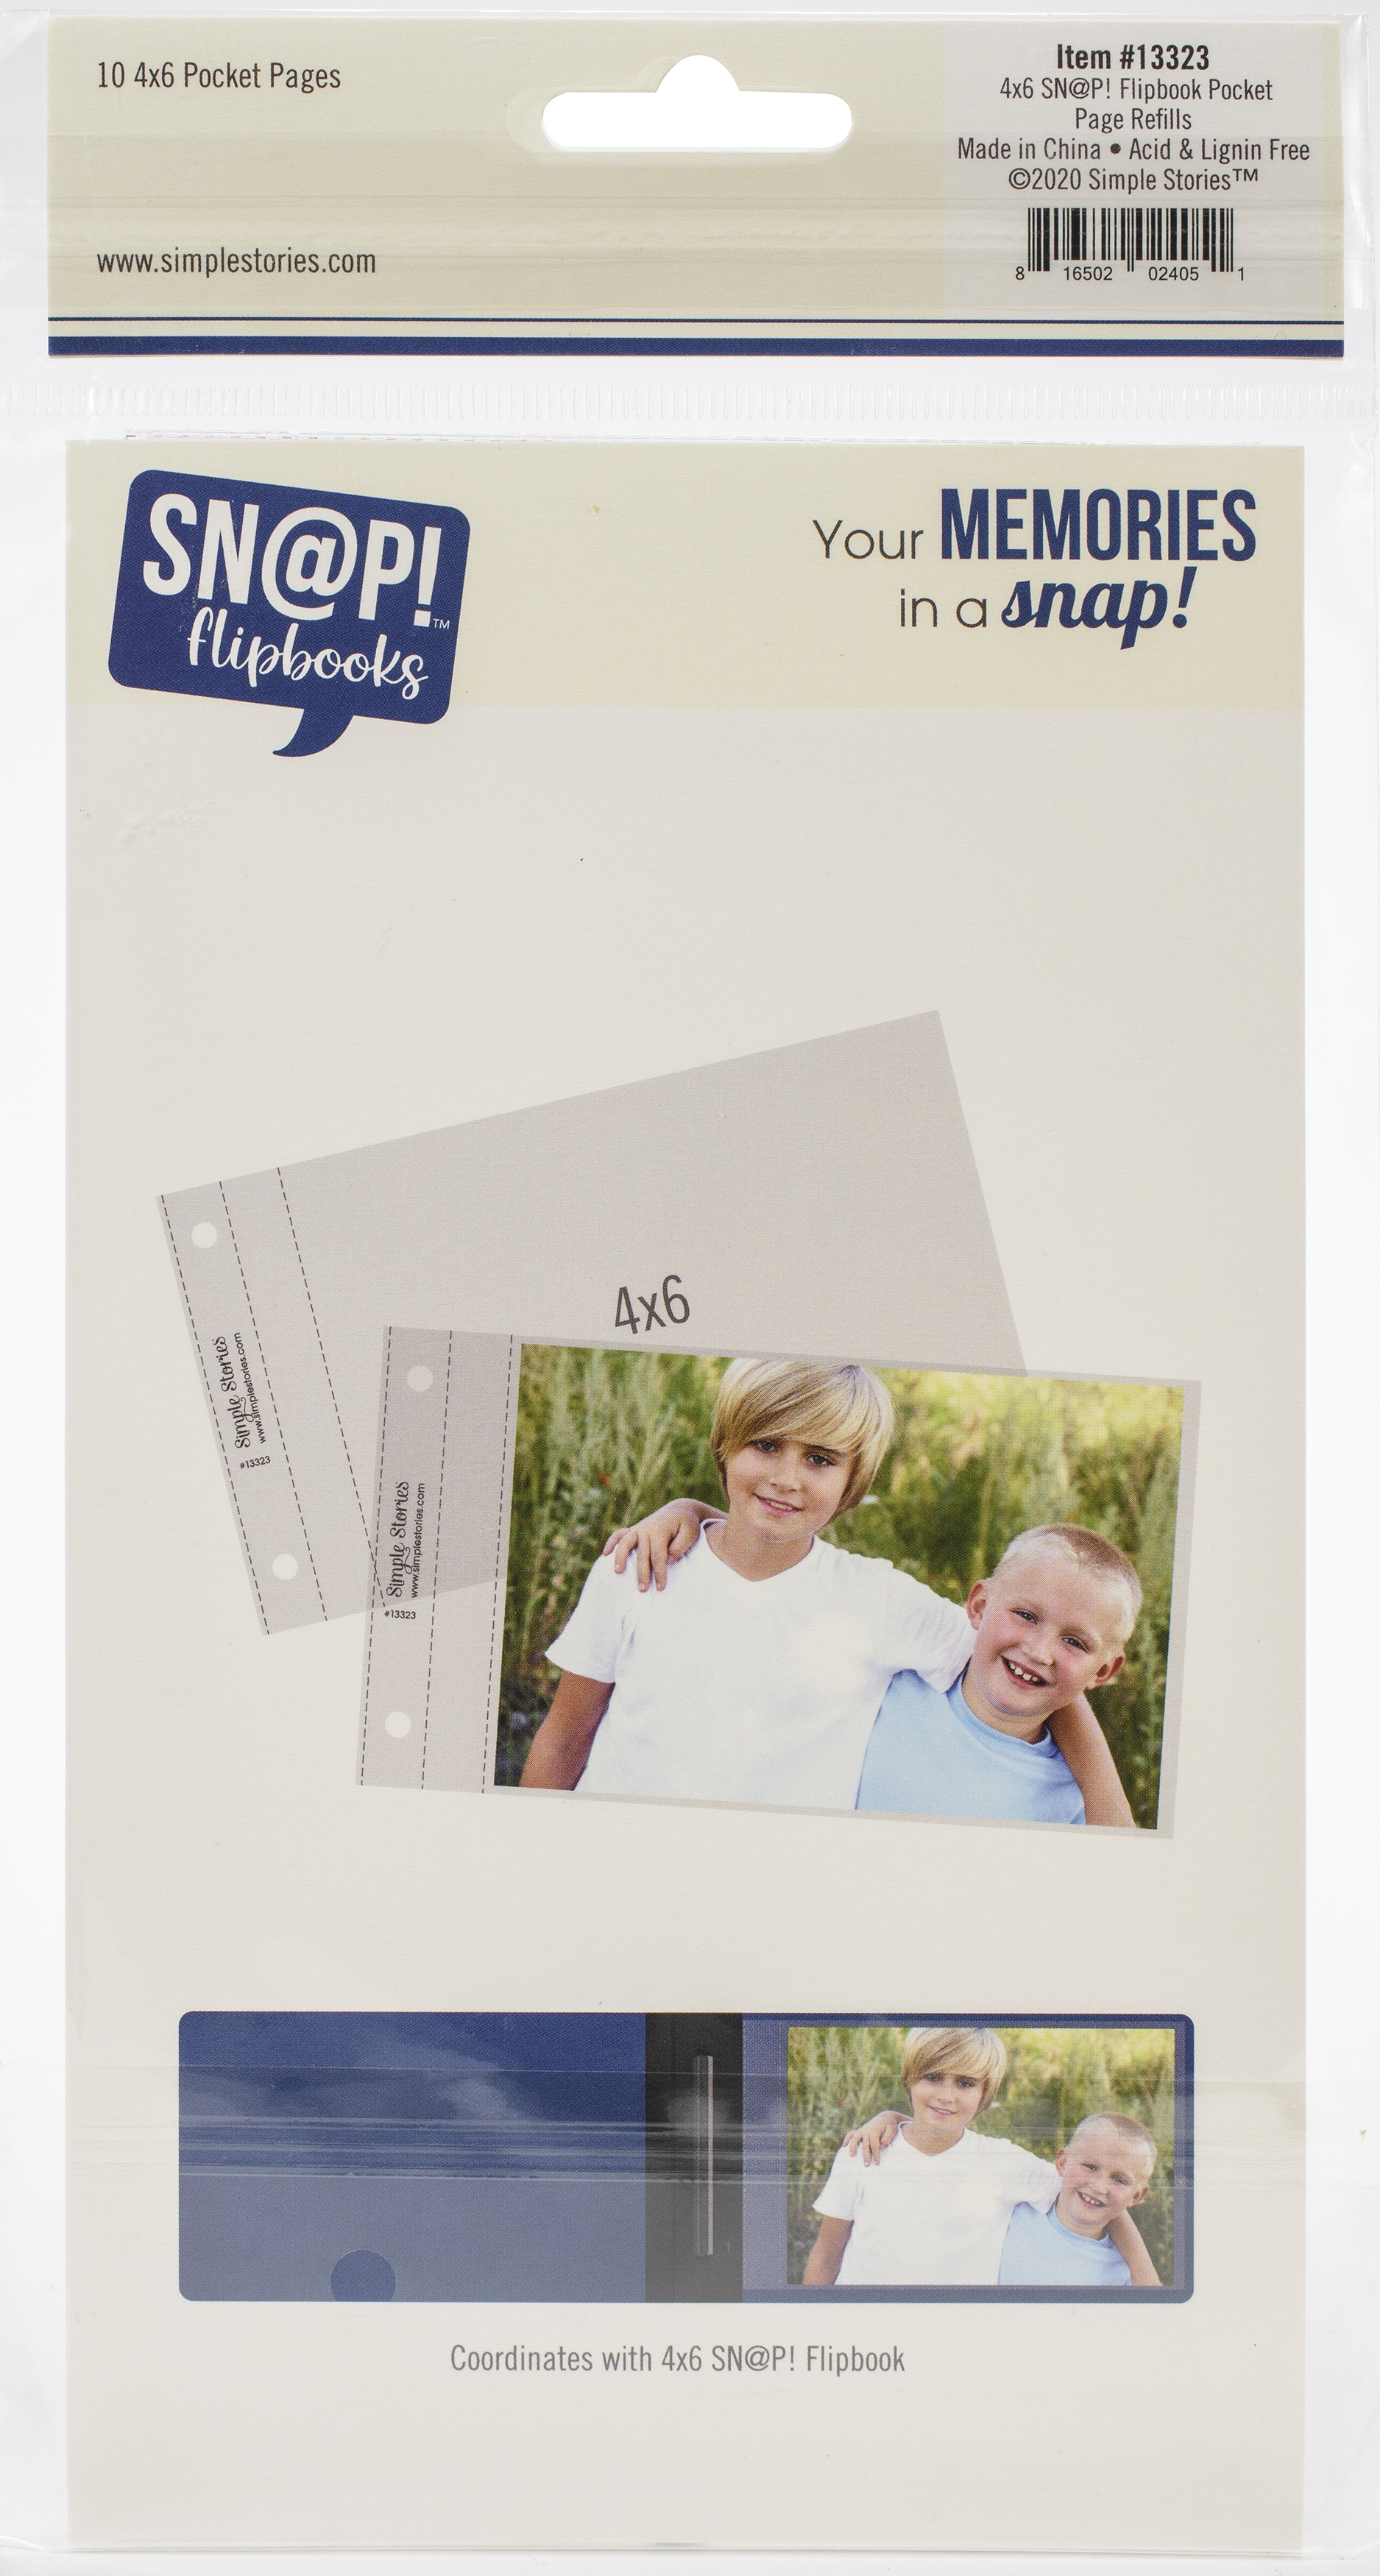 Simple Stories Sn@p! Pocket Pages For 4X6 Flipbooks 10/Pkg-(1) 4X6 Pocket